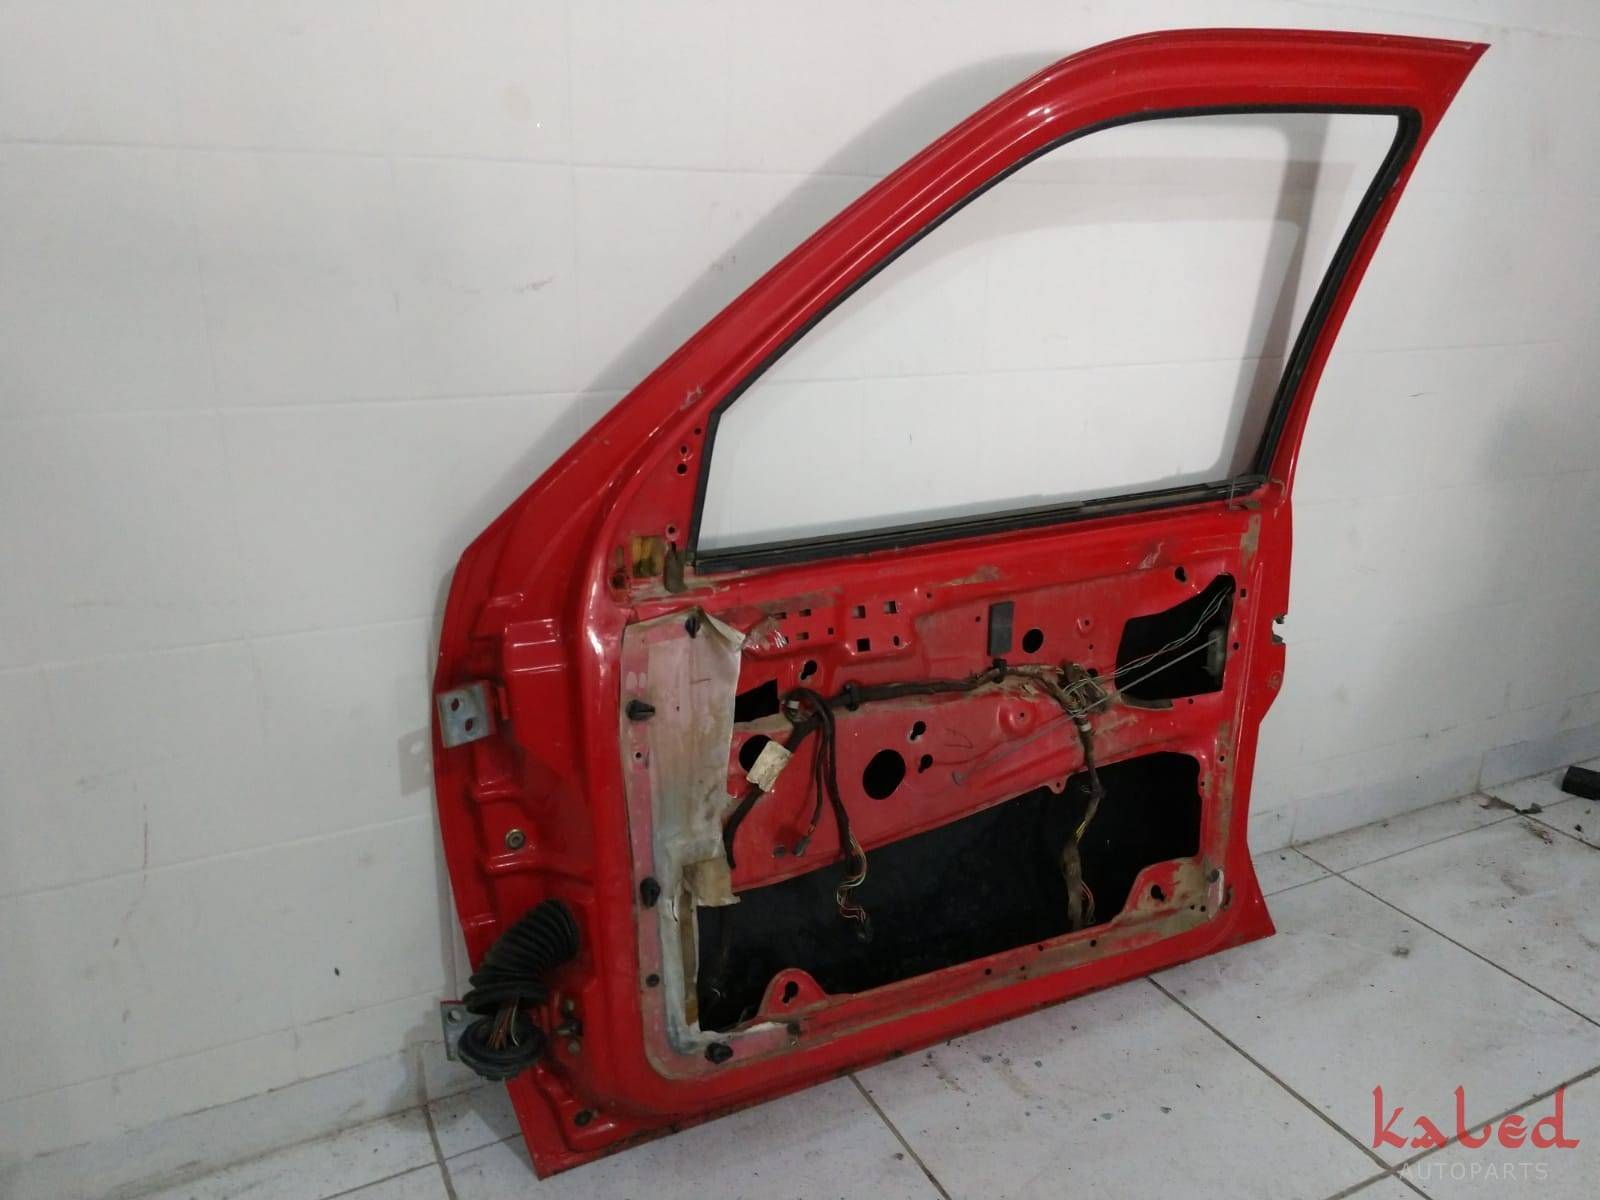 Porta dianteira direita Golf 4 portas 93 a 98 - Kaled Auto Parts